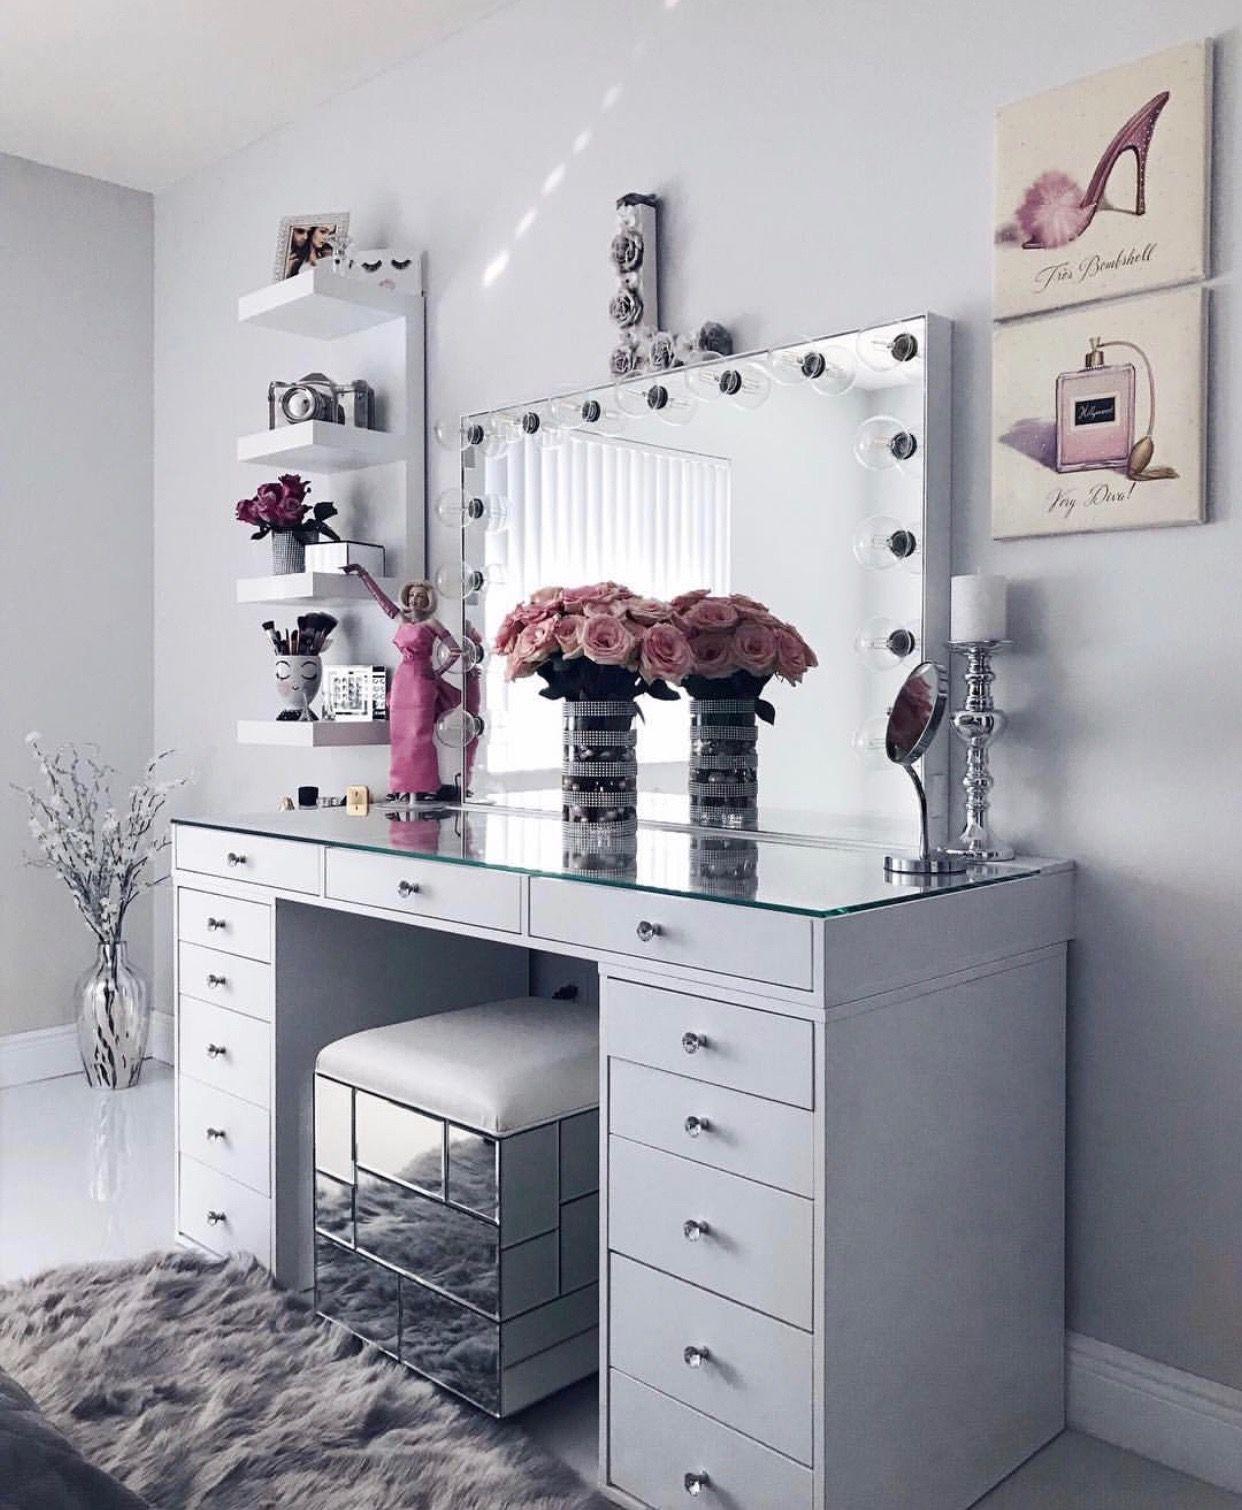 white clean sleek vanity decor paintings flowers glass rh pinterest com